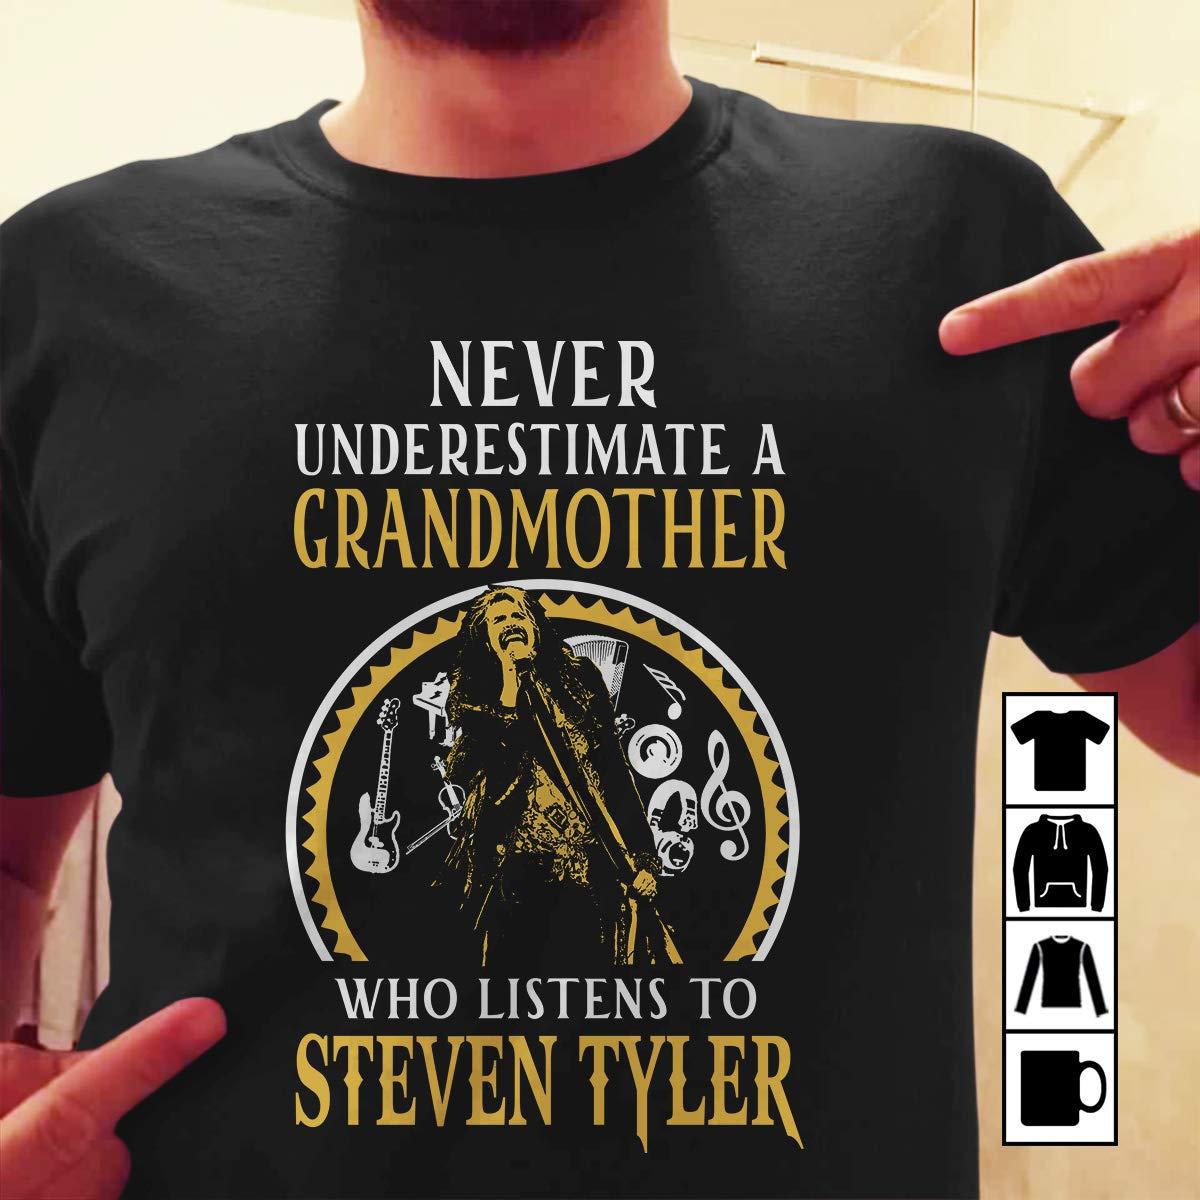 Steven Tyler Grandmother Grandmother Who Listens To Steven Tyler Sweat Shirts